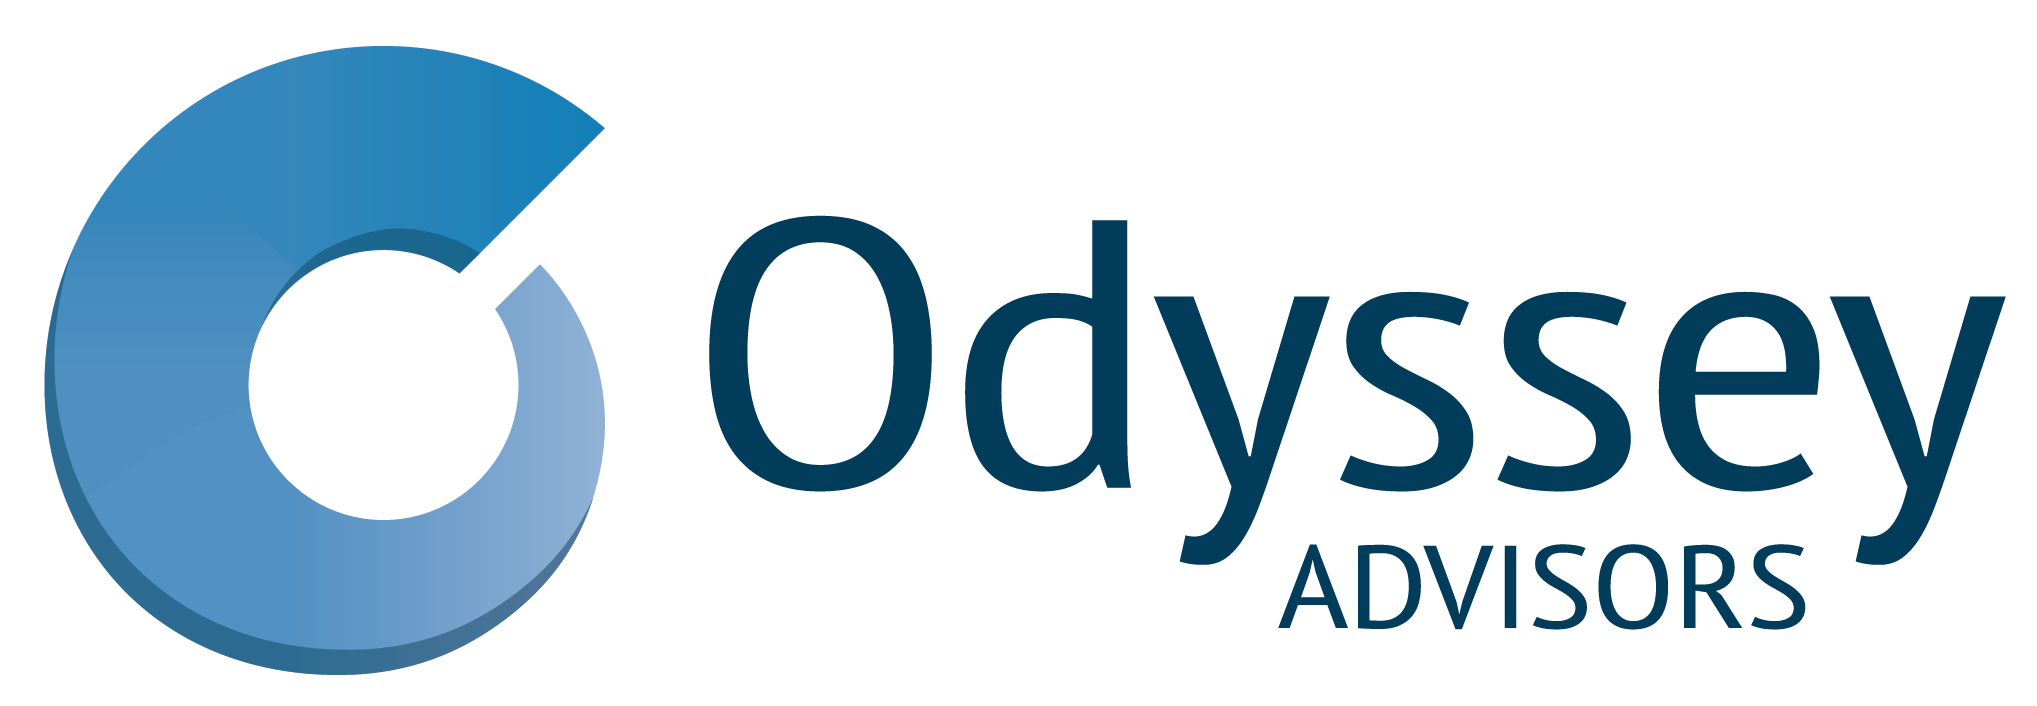 https://www.krative.com/wp-content/uploads/2019/07/Odyssey-Logo.png